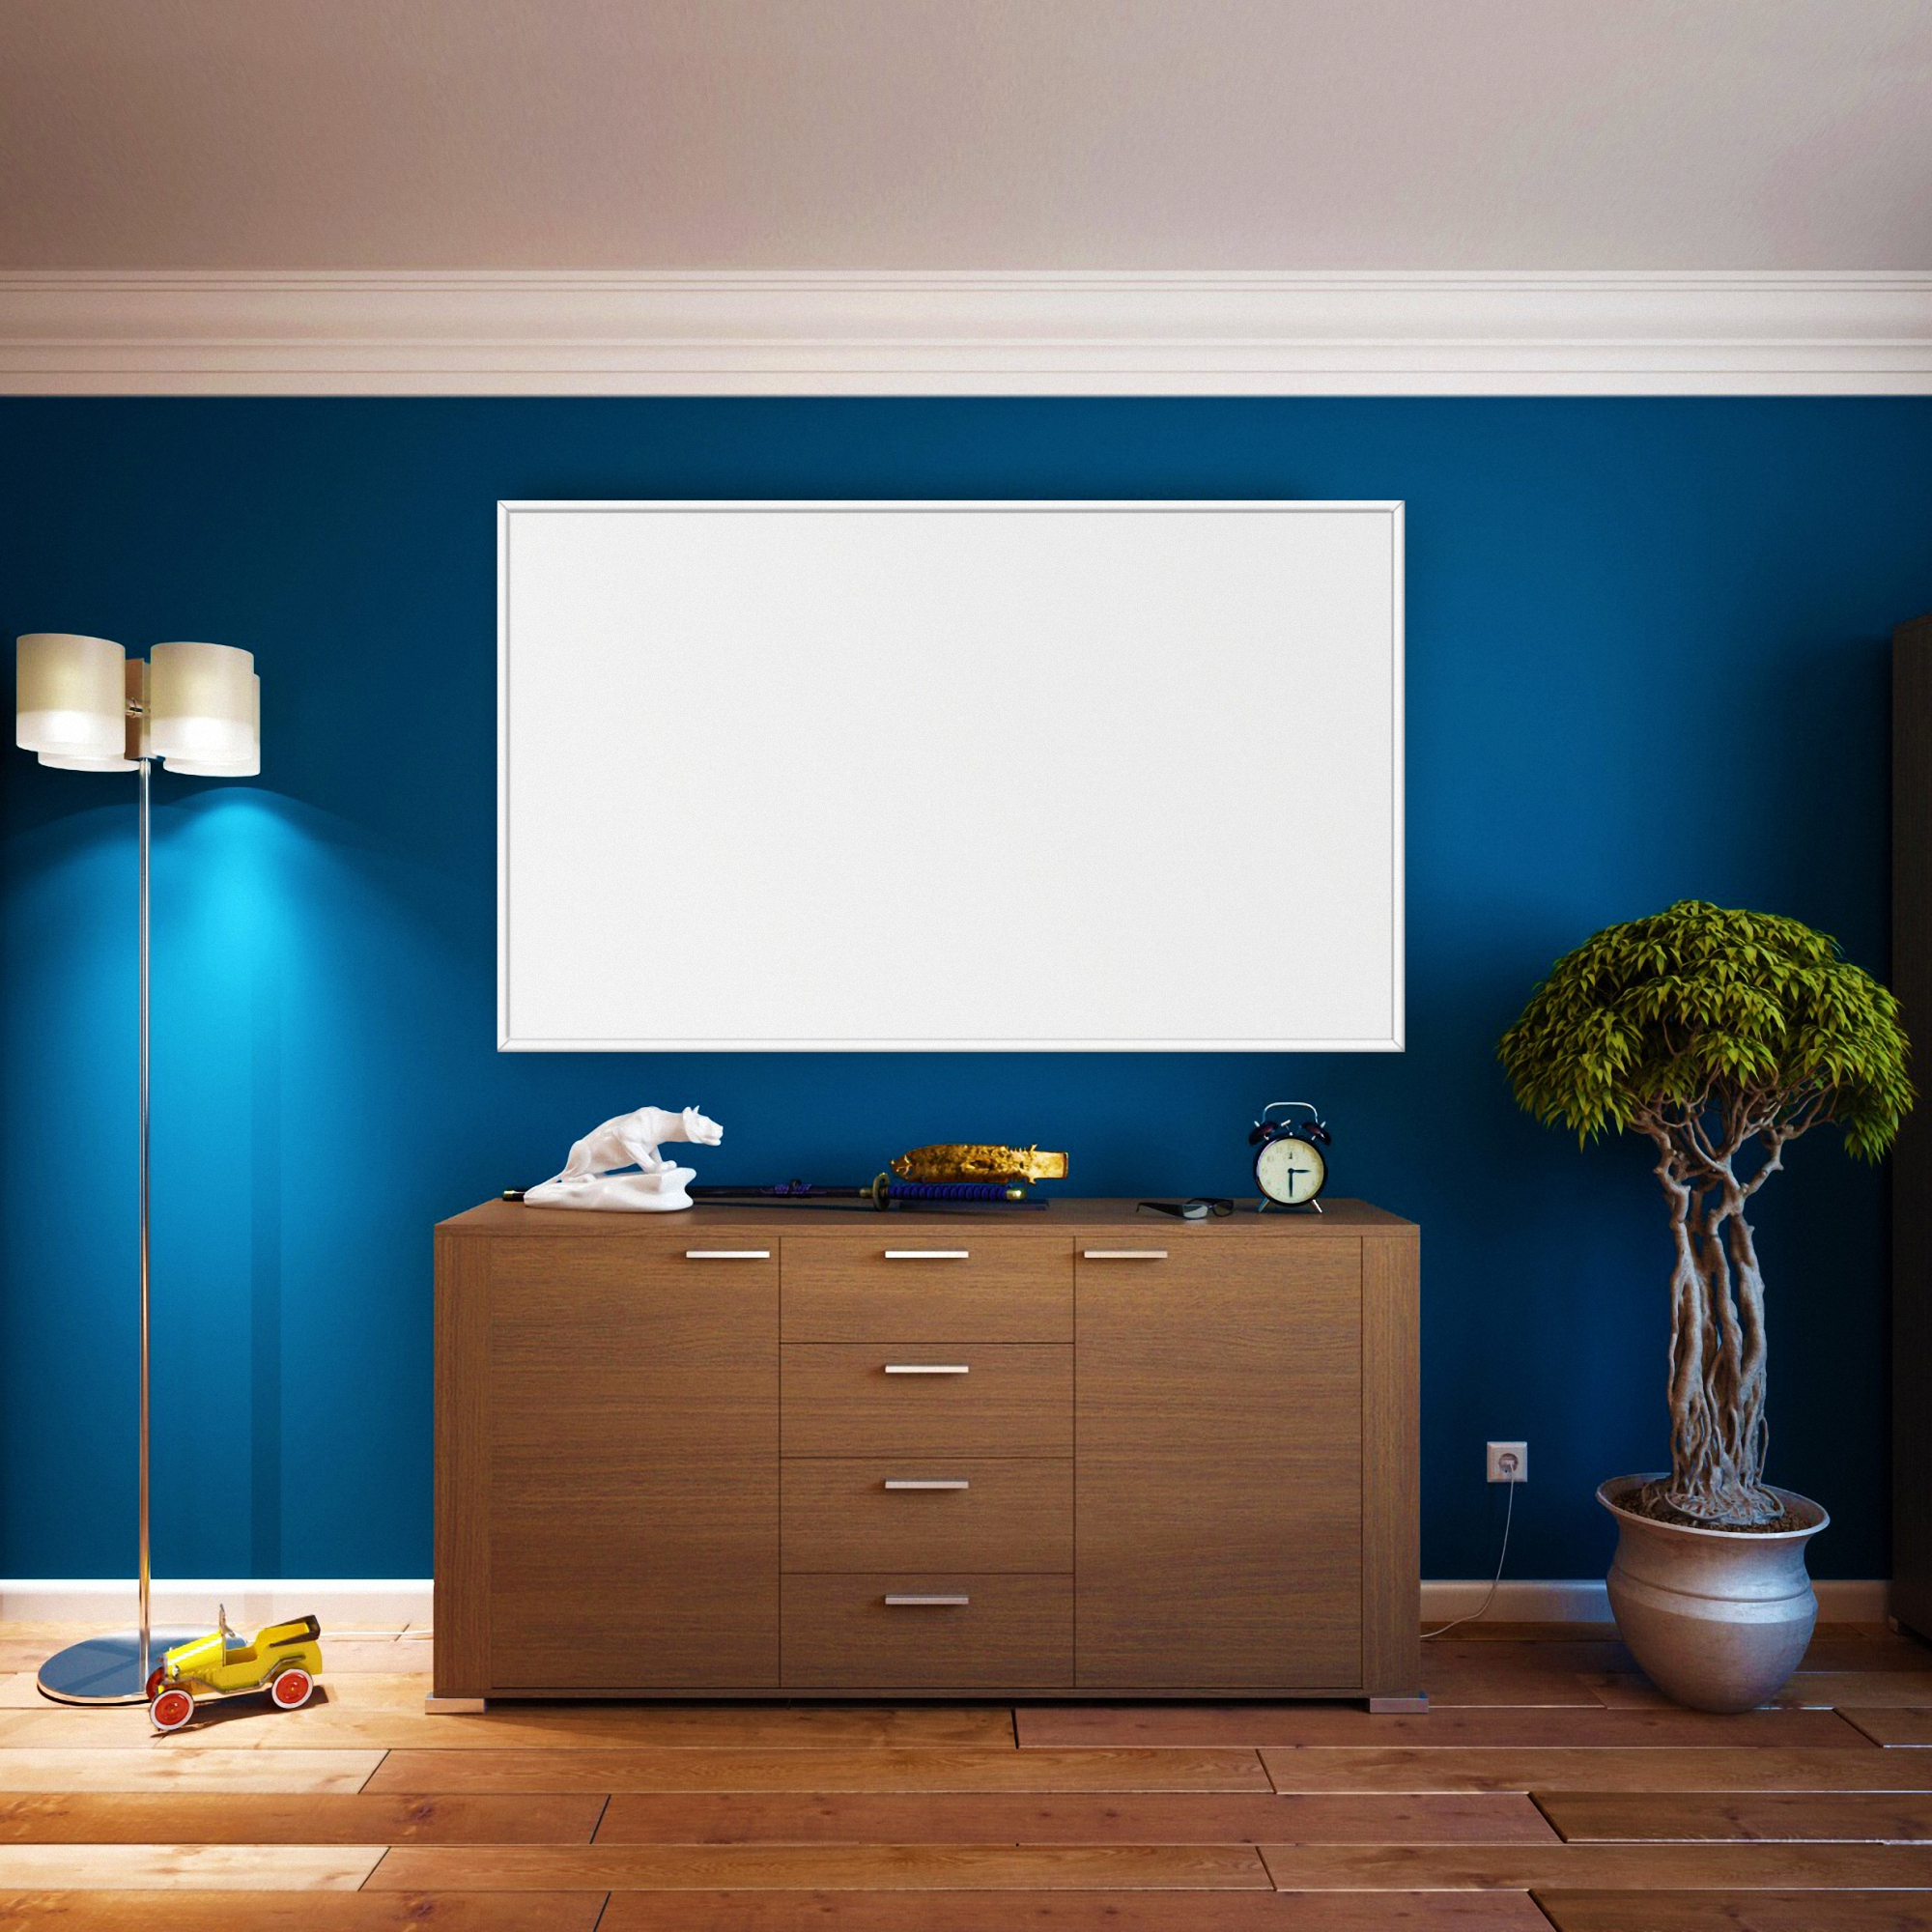 viesta infrarotheizung heizpaneel wandheizung. Black Bedroom Furniture Sets. Home Design Ideas